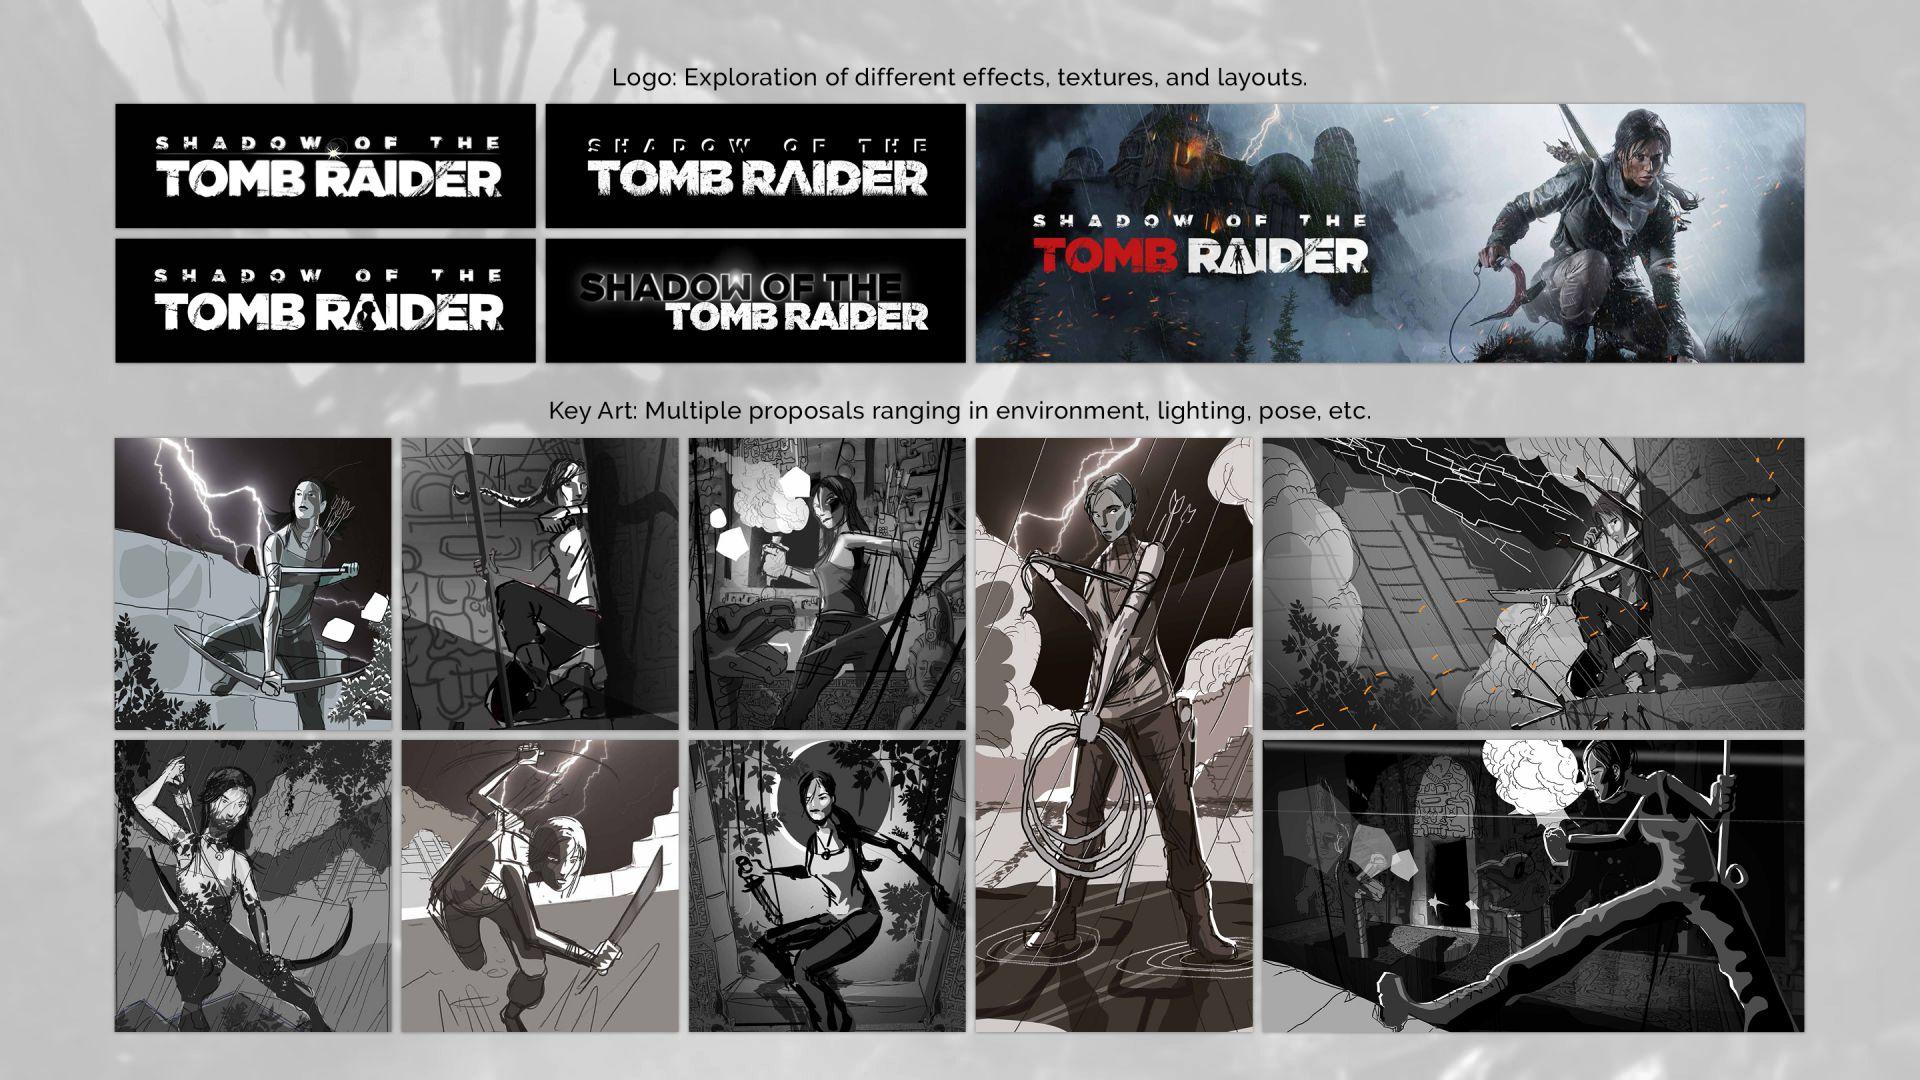 Shadow-of-the-Tomb-Raider-logo-generacio